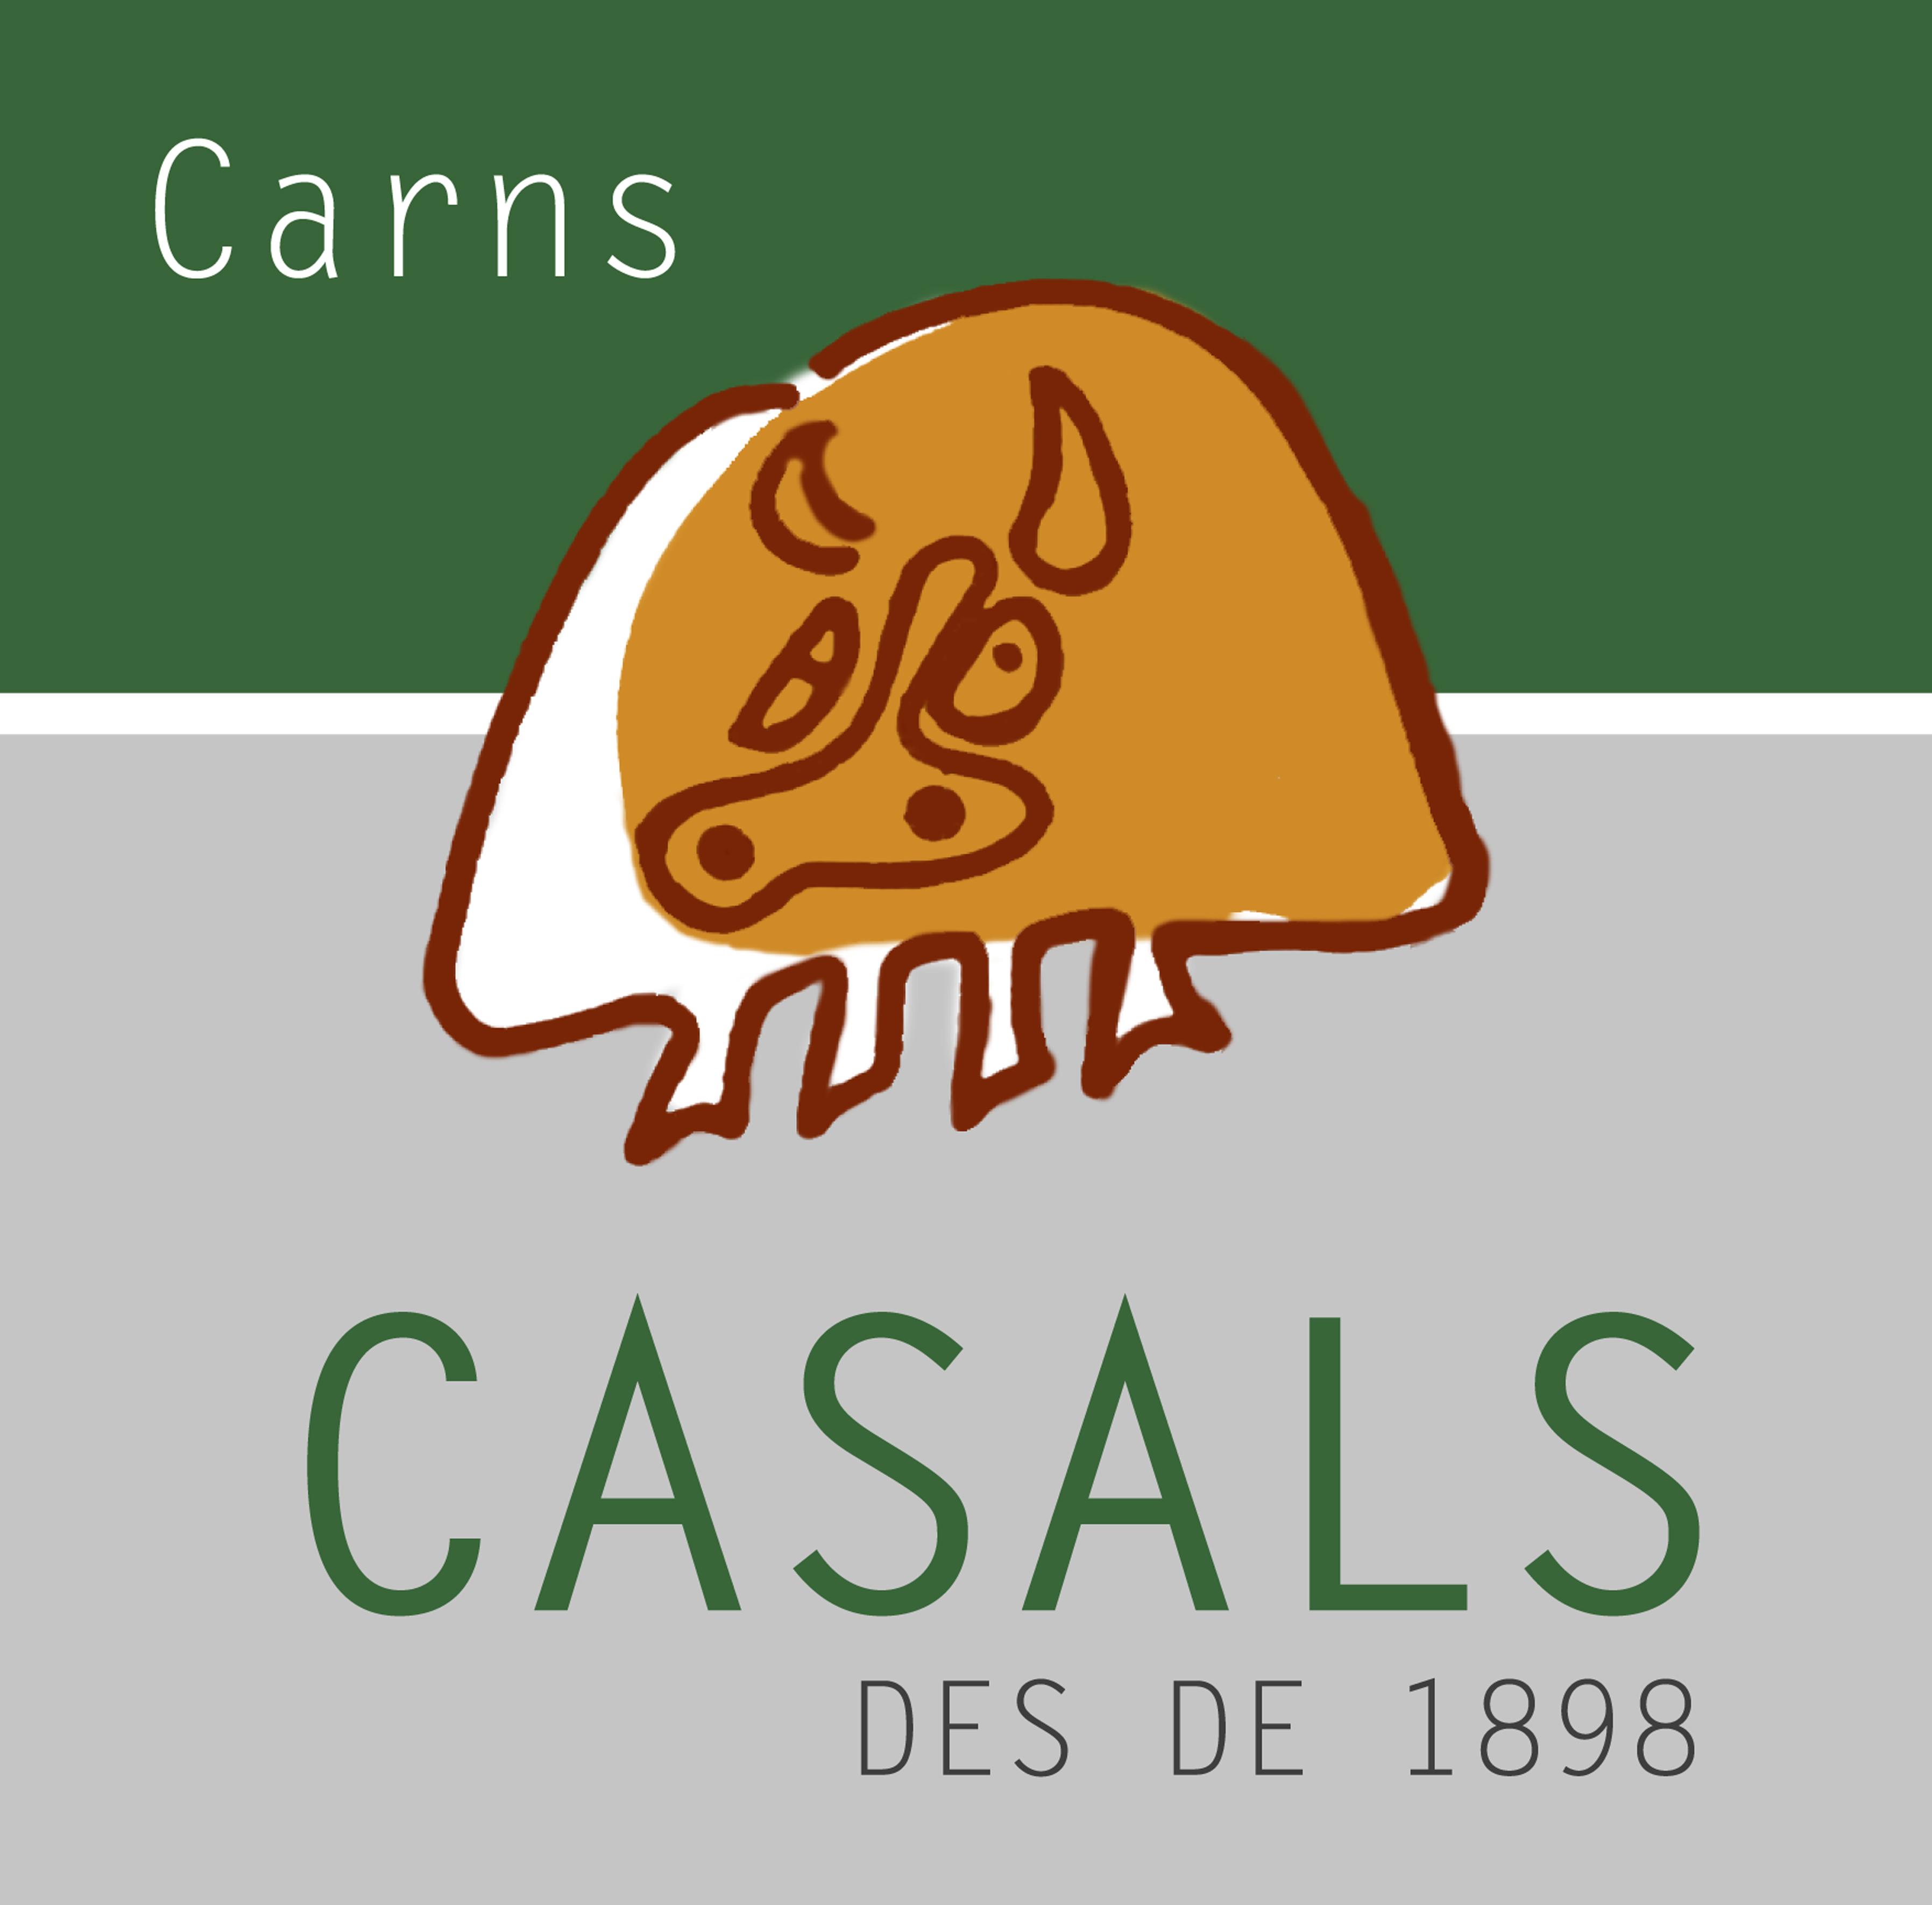 Logo comerç CARNS CASALS